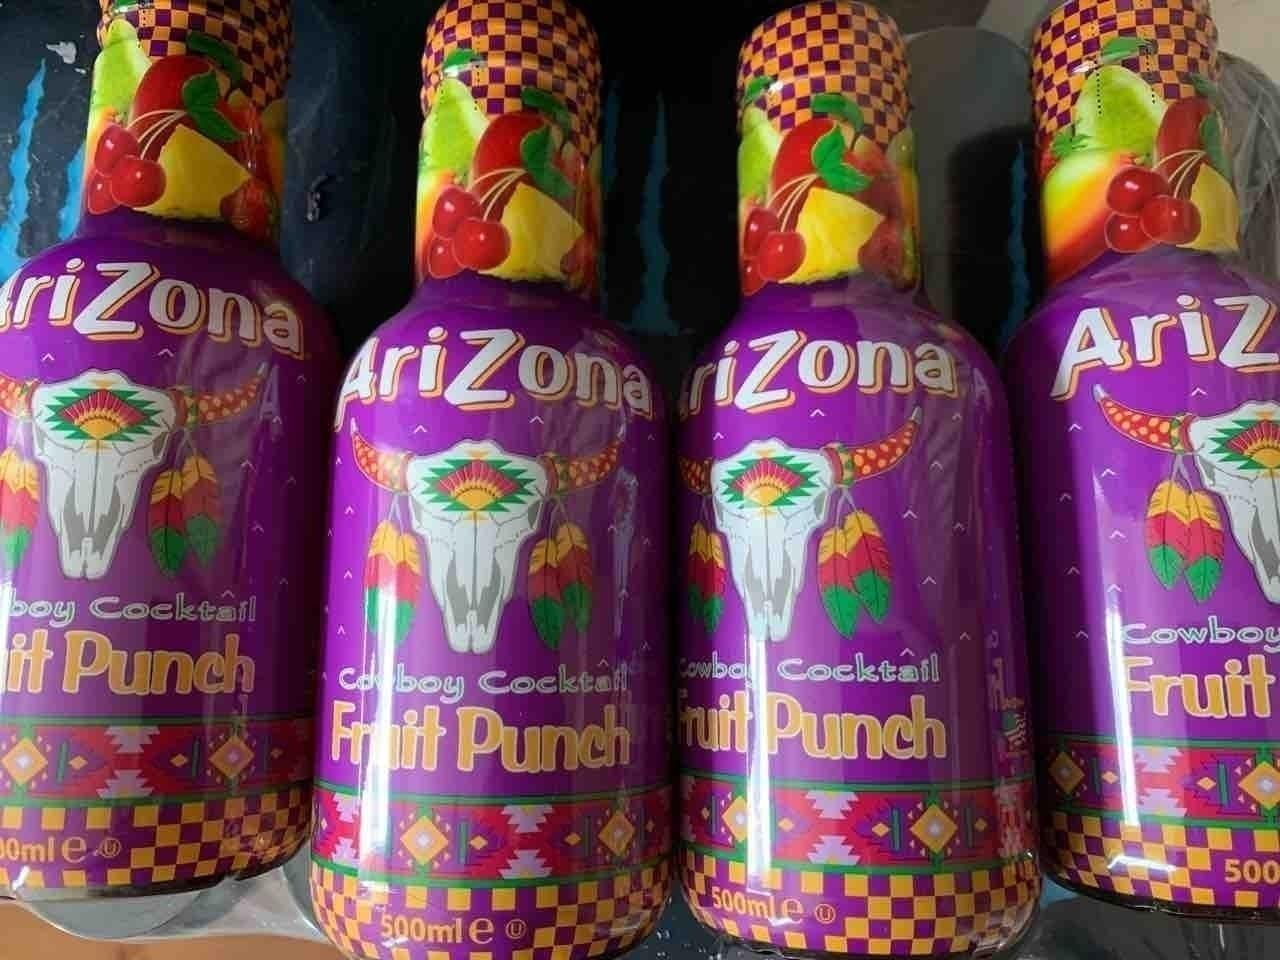 Arizona fruit punch ( 2 bottles per person please)